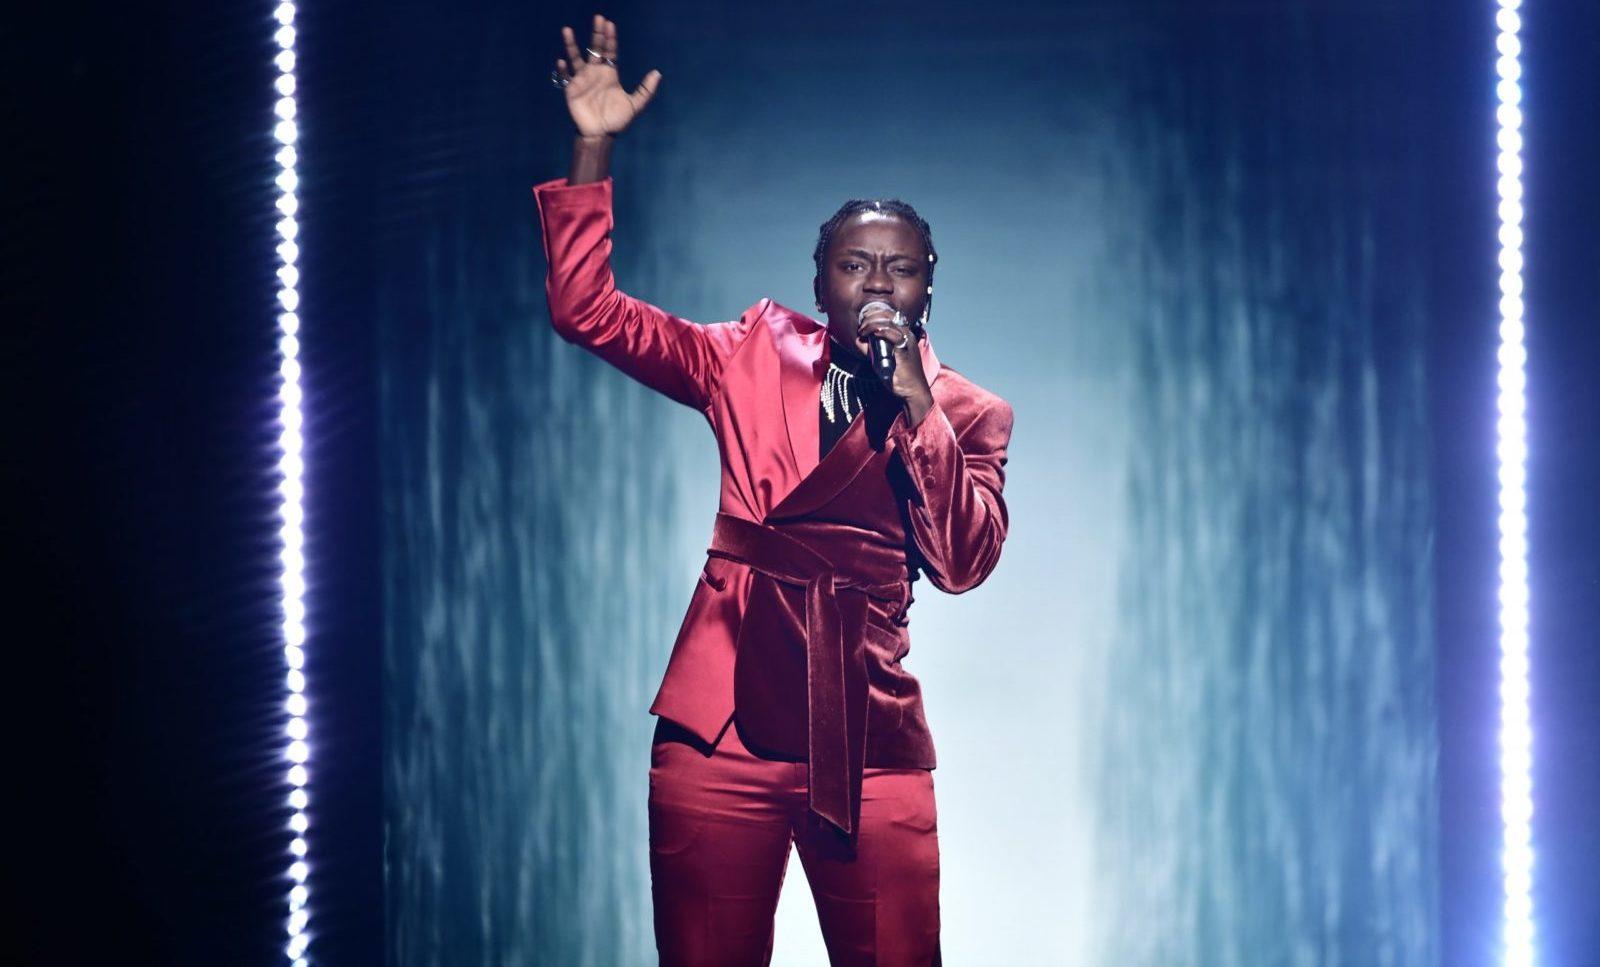 Tusse švedski predstavnik na Eurosongu 2021 i nastup na Melodifestivalenu 2021